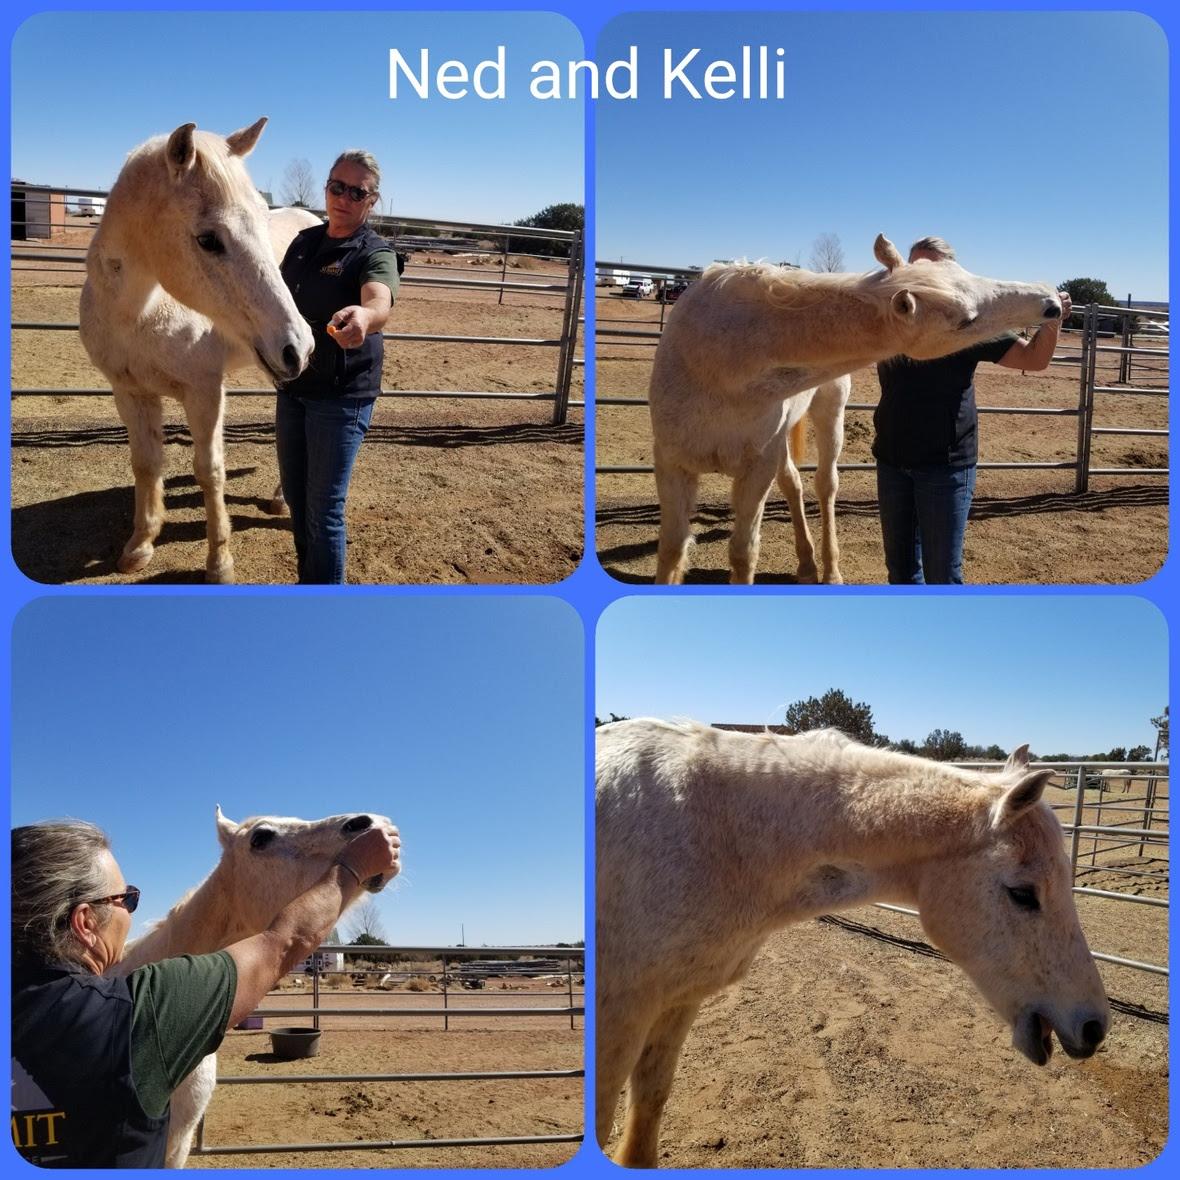 20210301 Ned and Kelli bodywork